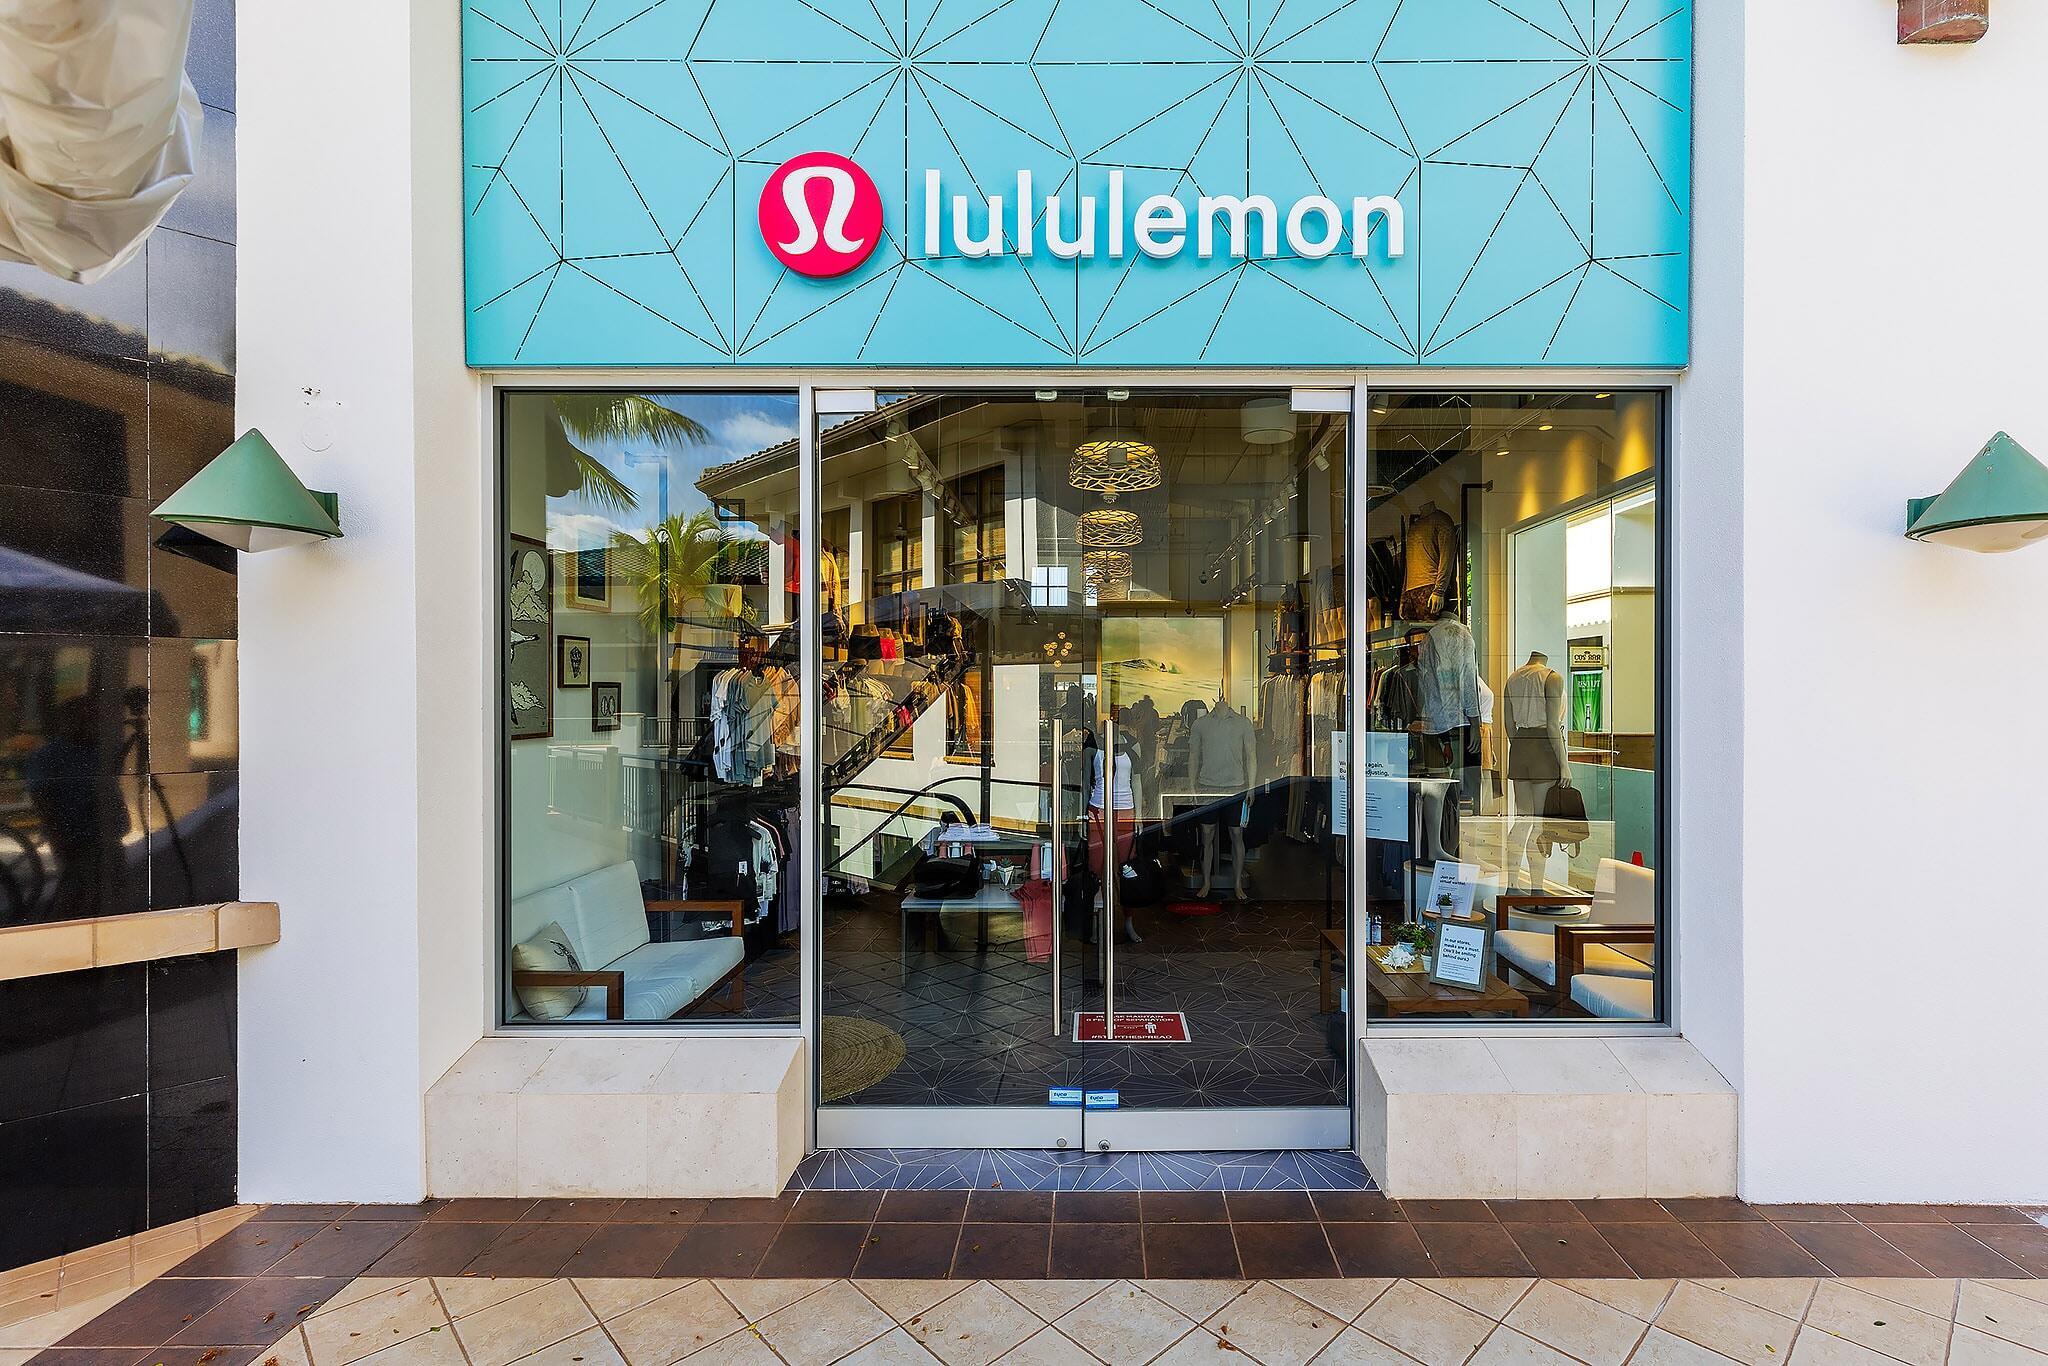 Lululemon-The-Shops-at-Wailea-08-08-2020-004 copy